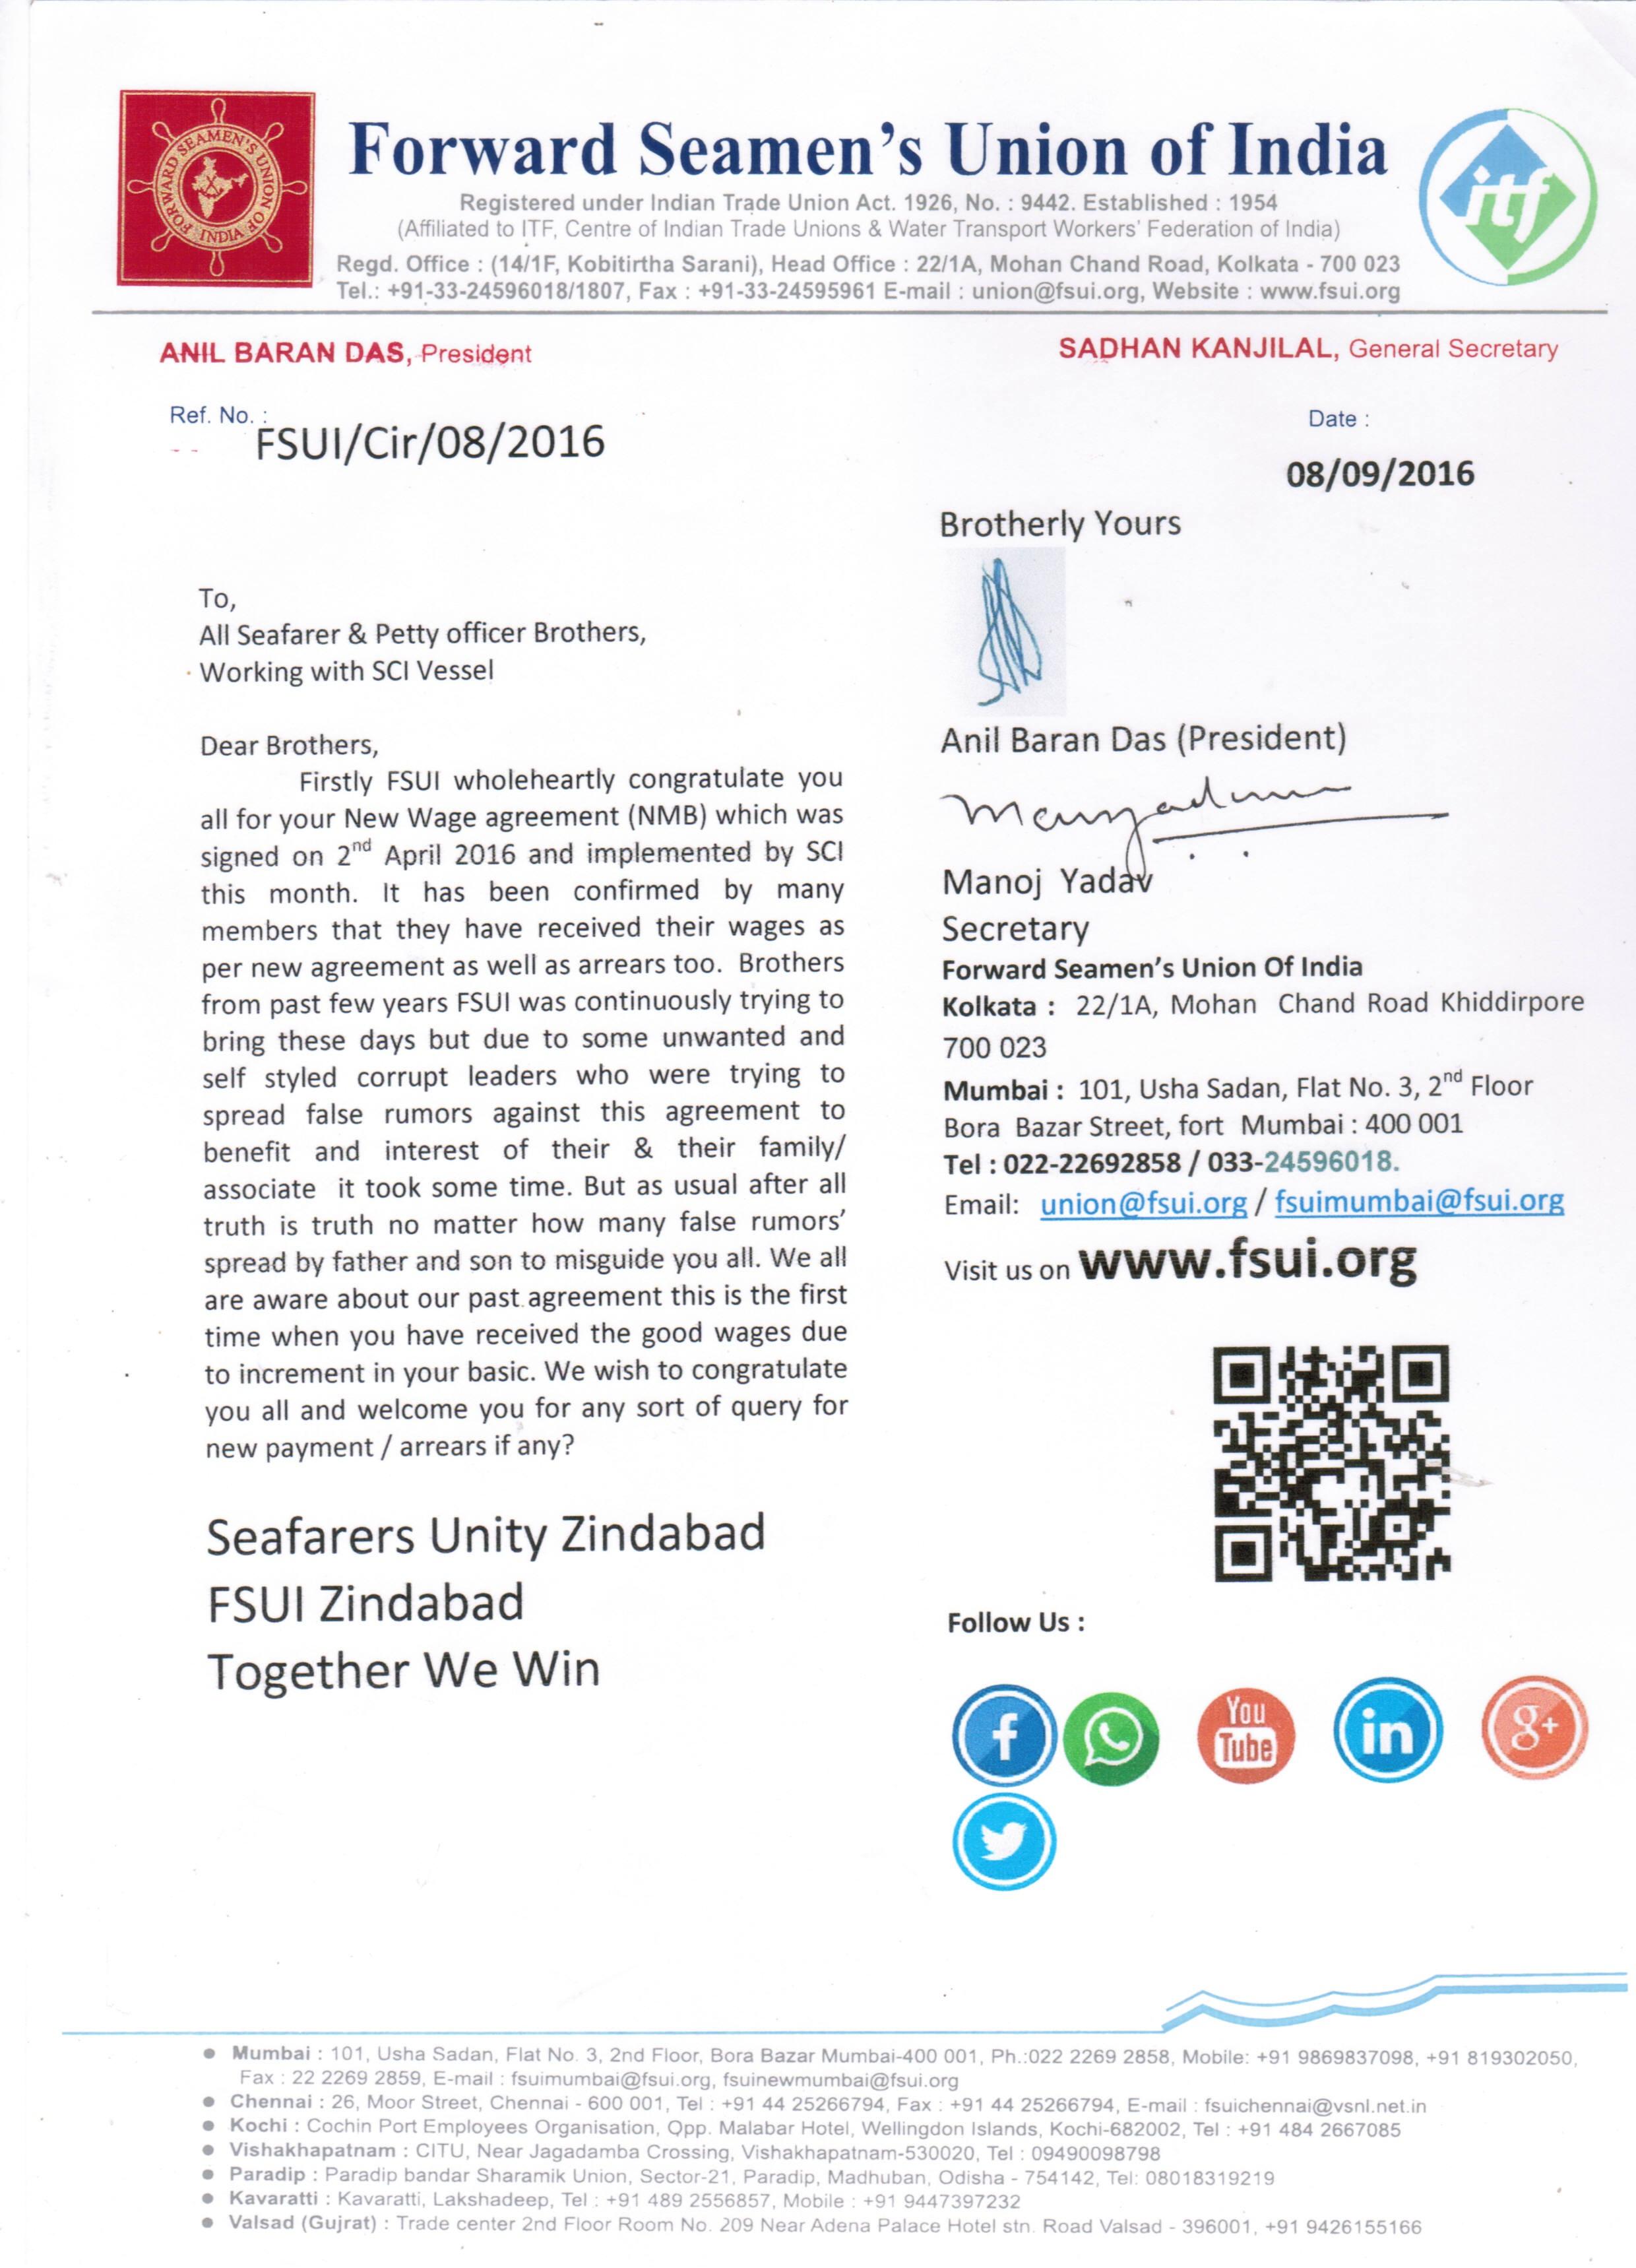 Forward Seamens Union Of India